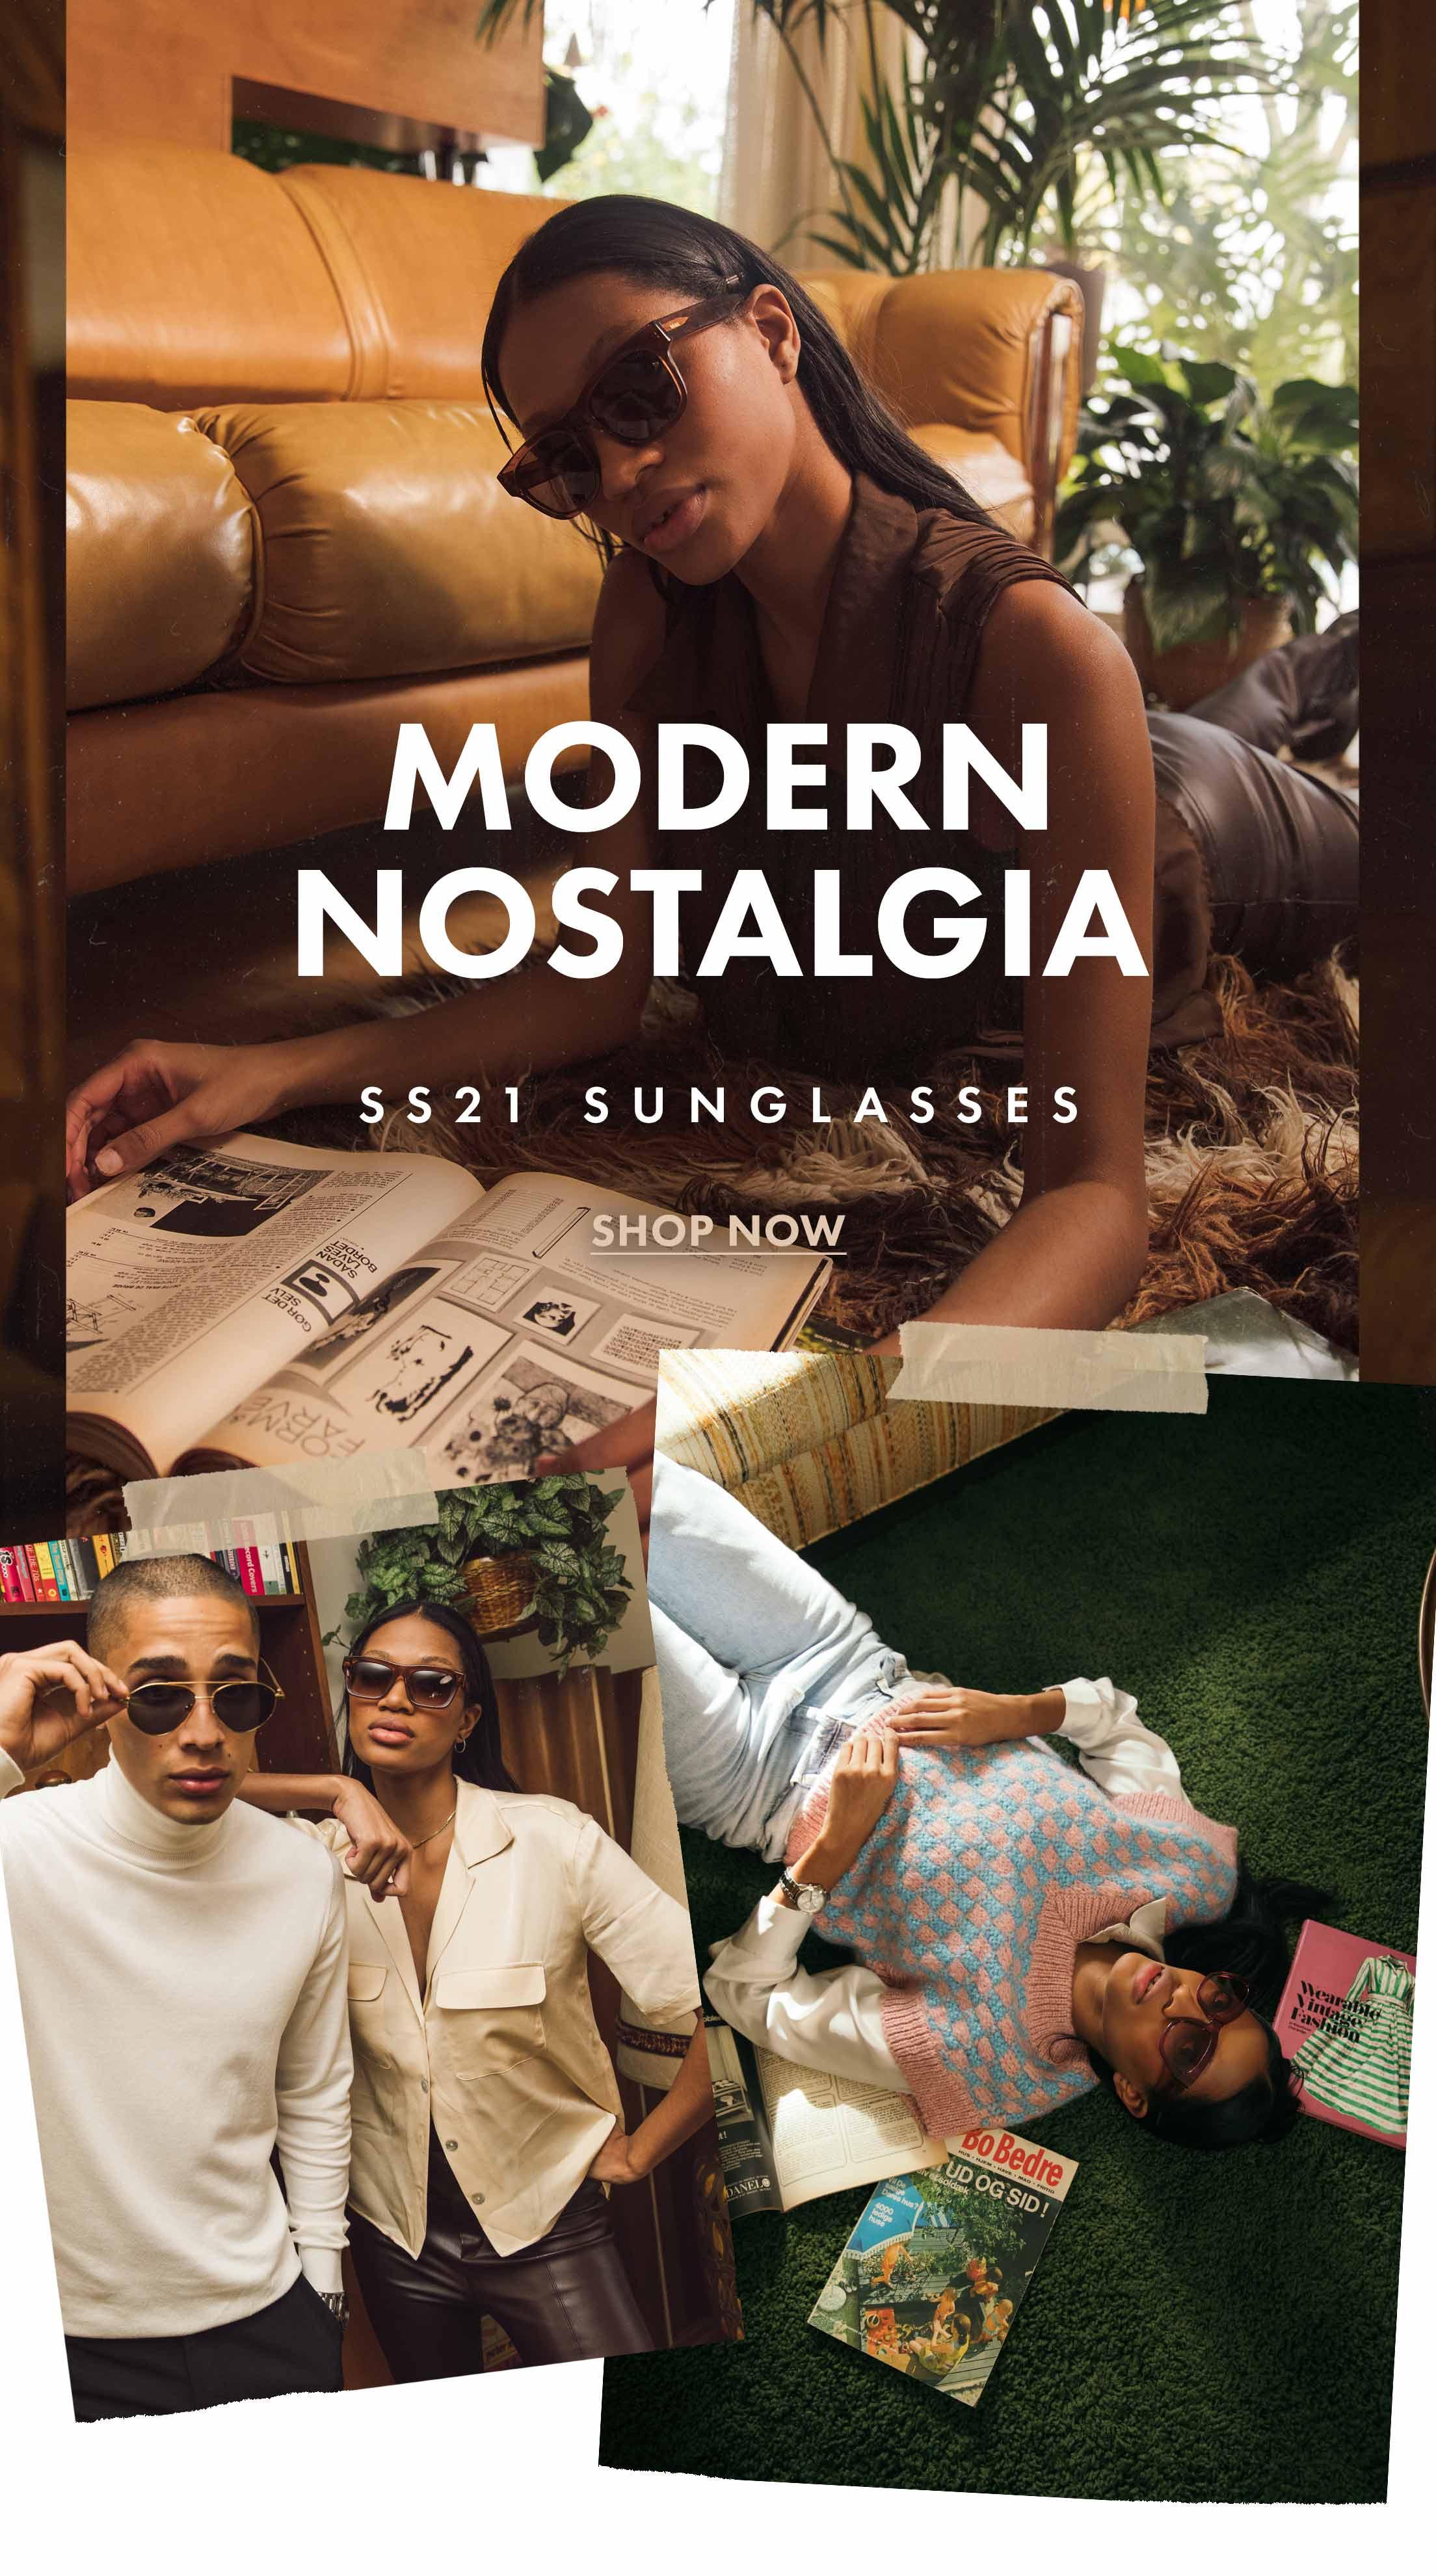 SS21 Sunglasses - Modern Nastalgia: Shop Now